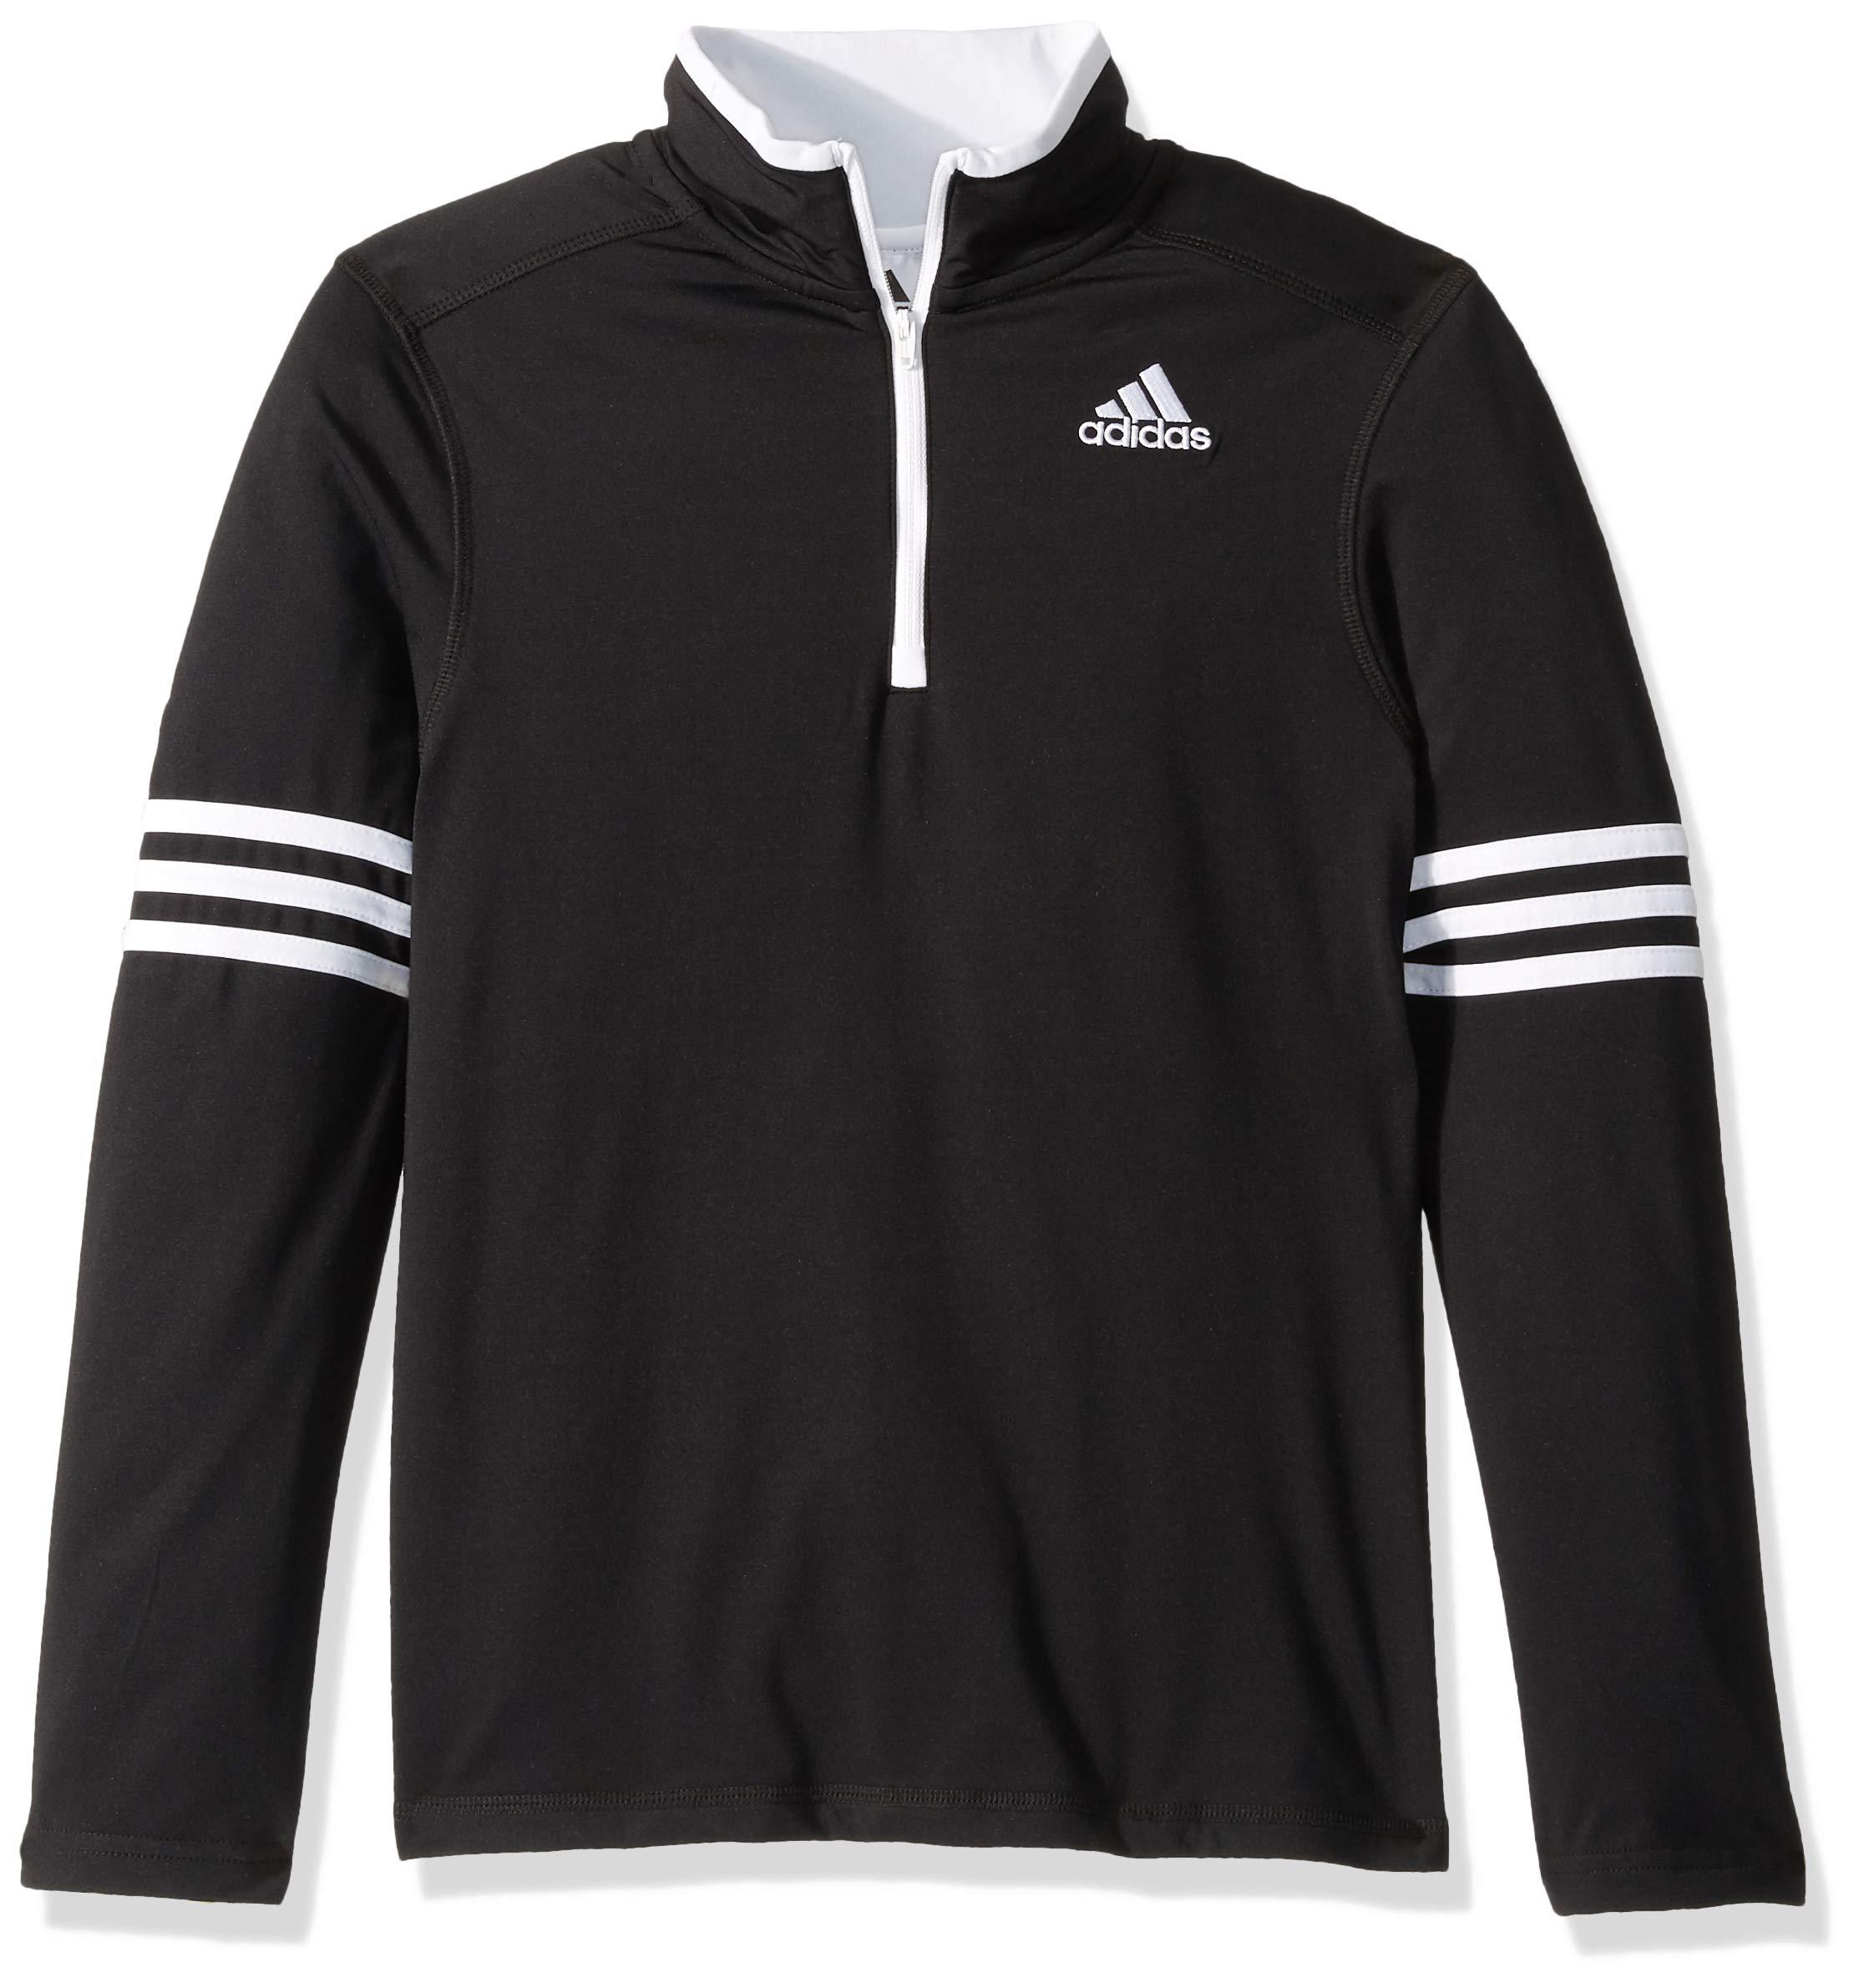 adidas Boys' Big Athletic Quarterzip, Black, S (8/10)